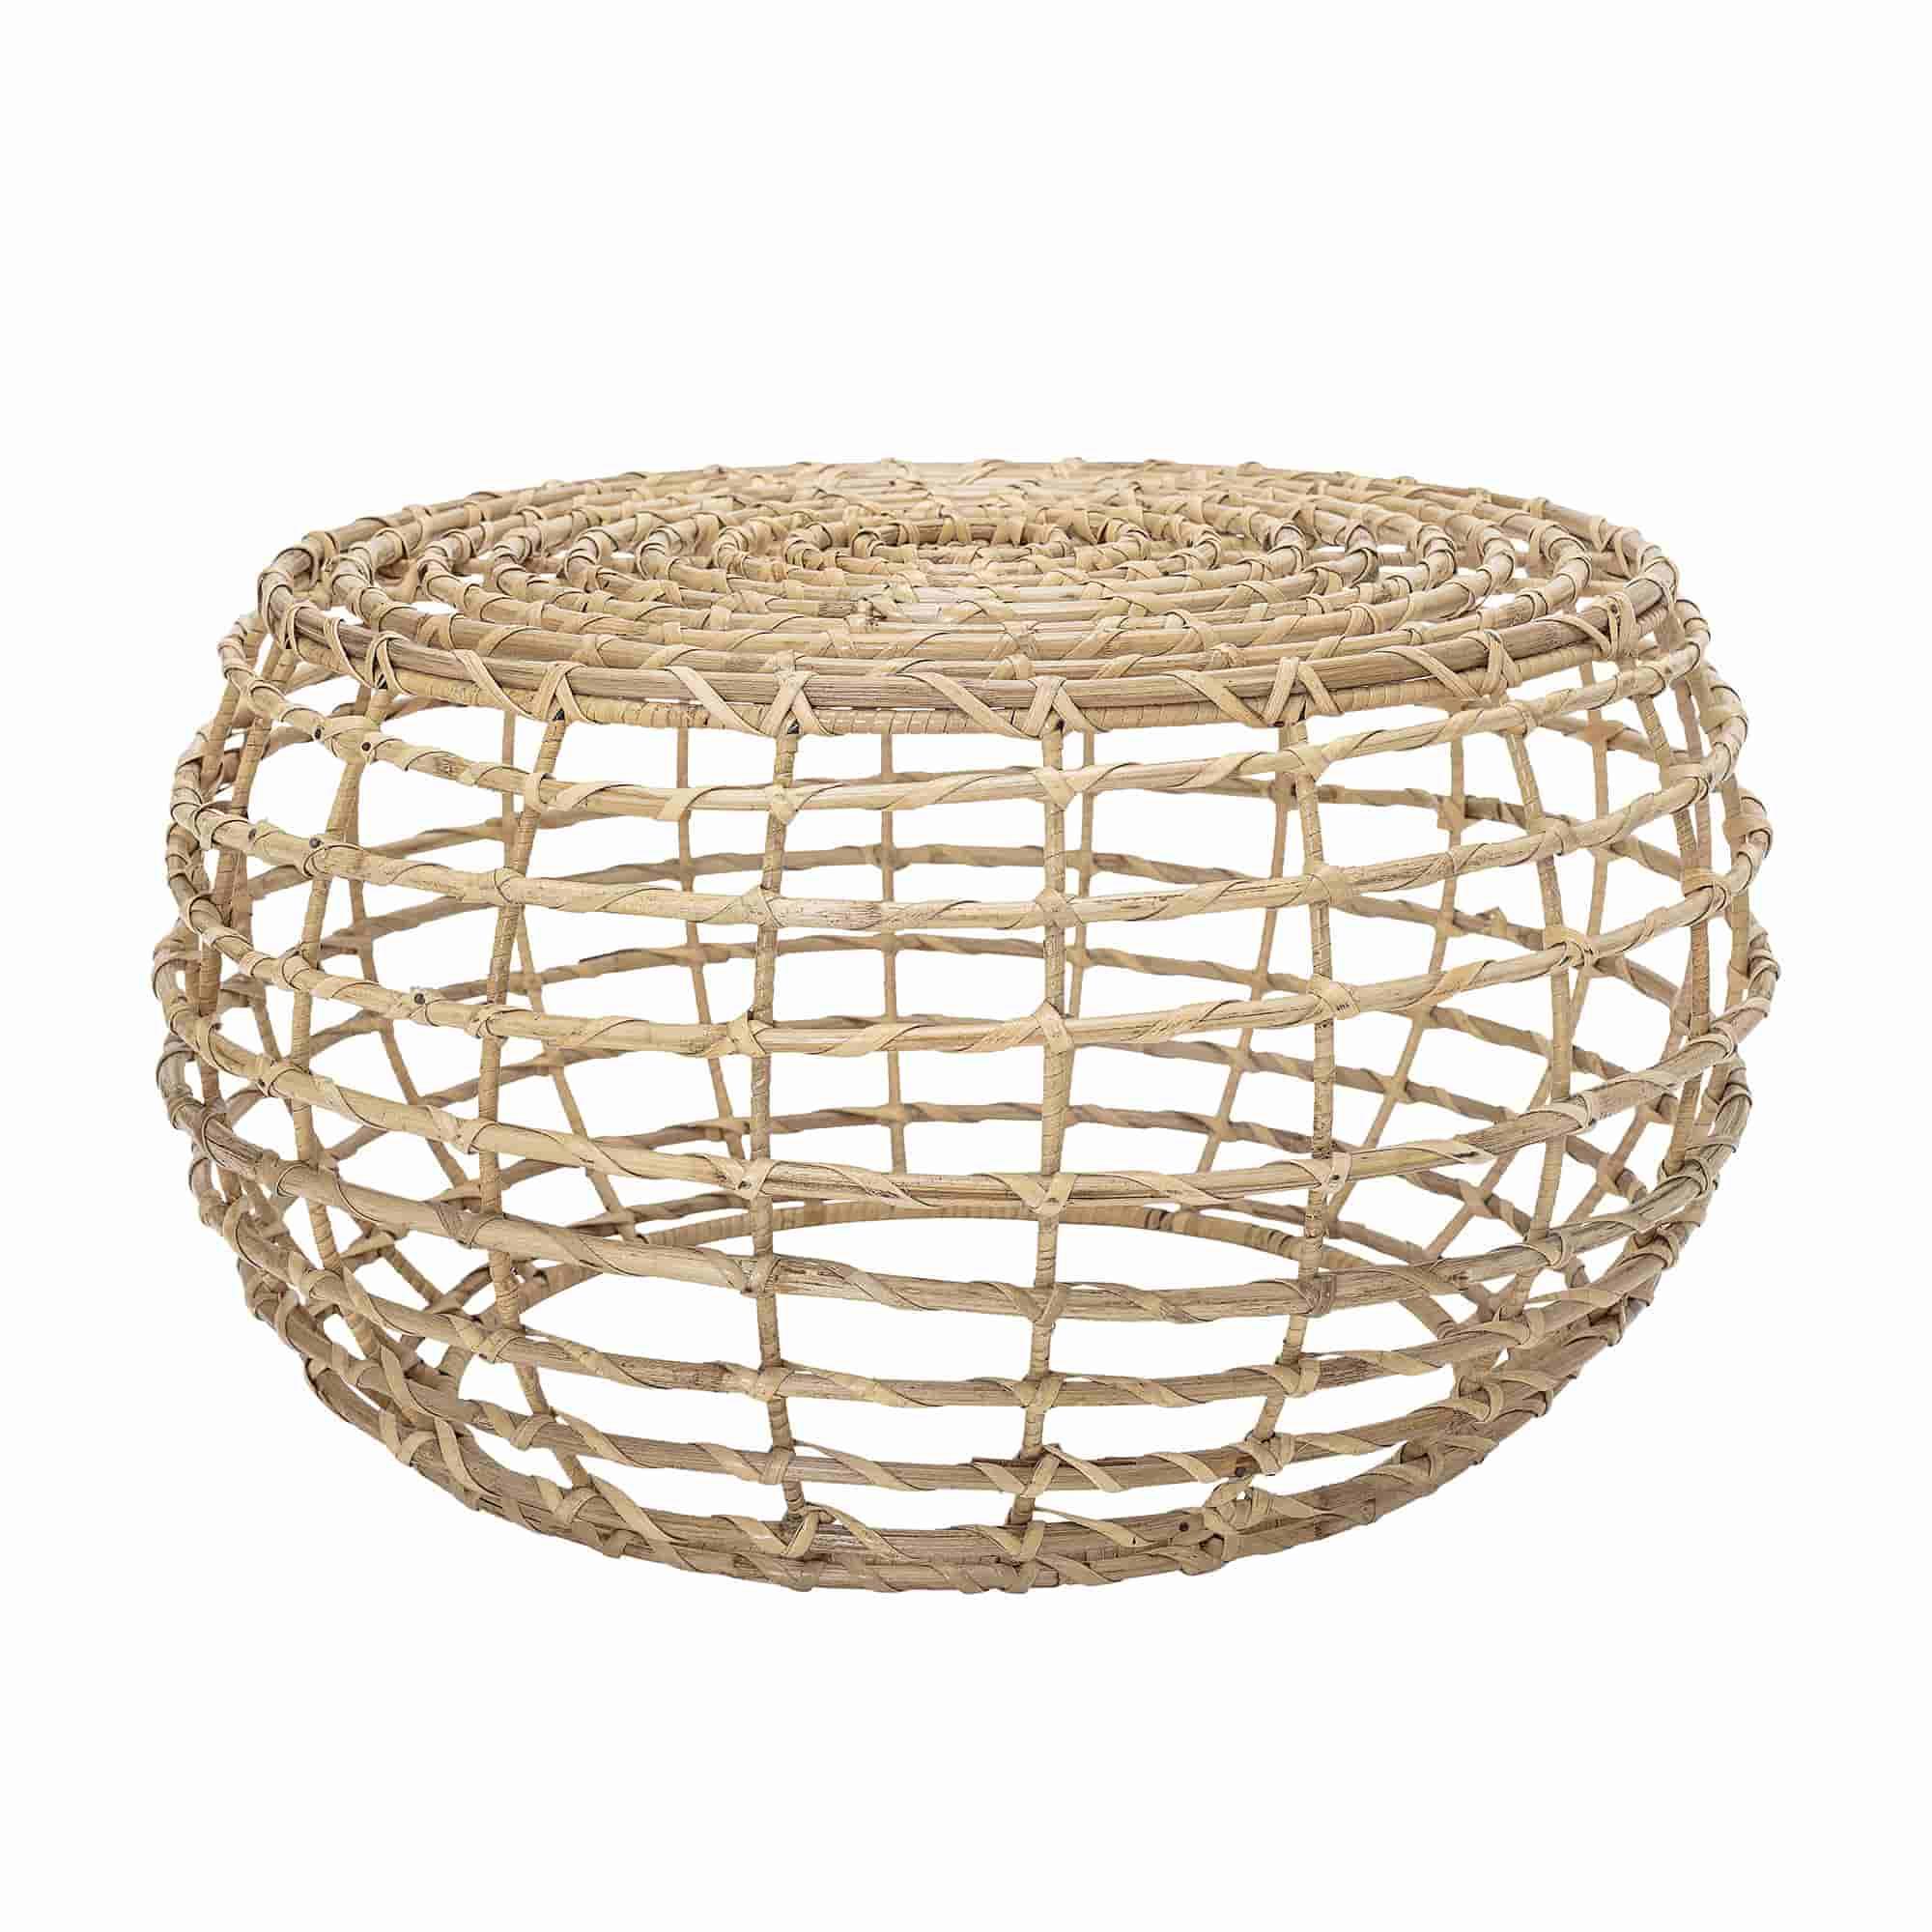 BLOOMINGVILLE Baril sofabord - natur sukkerrør, rund (Ø60)